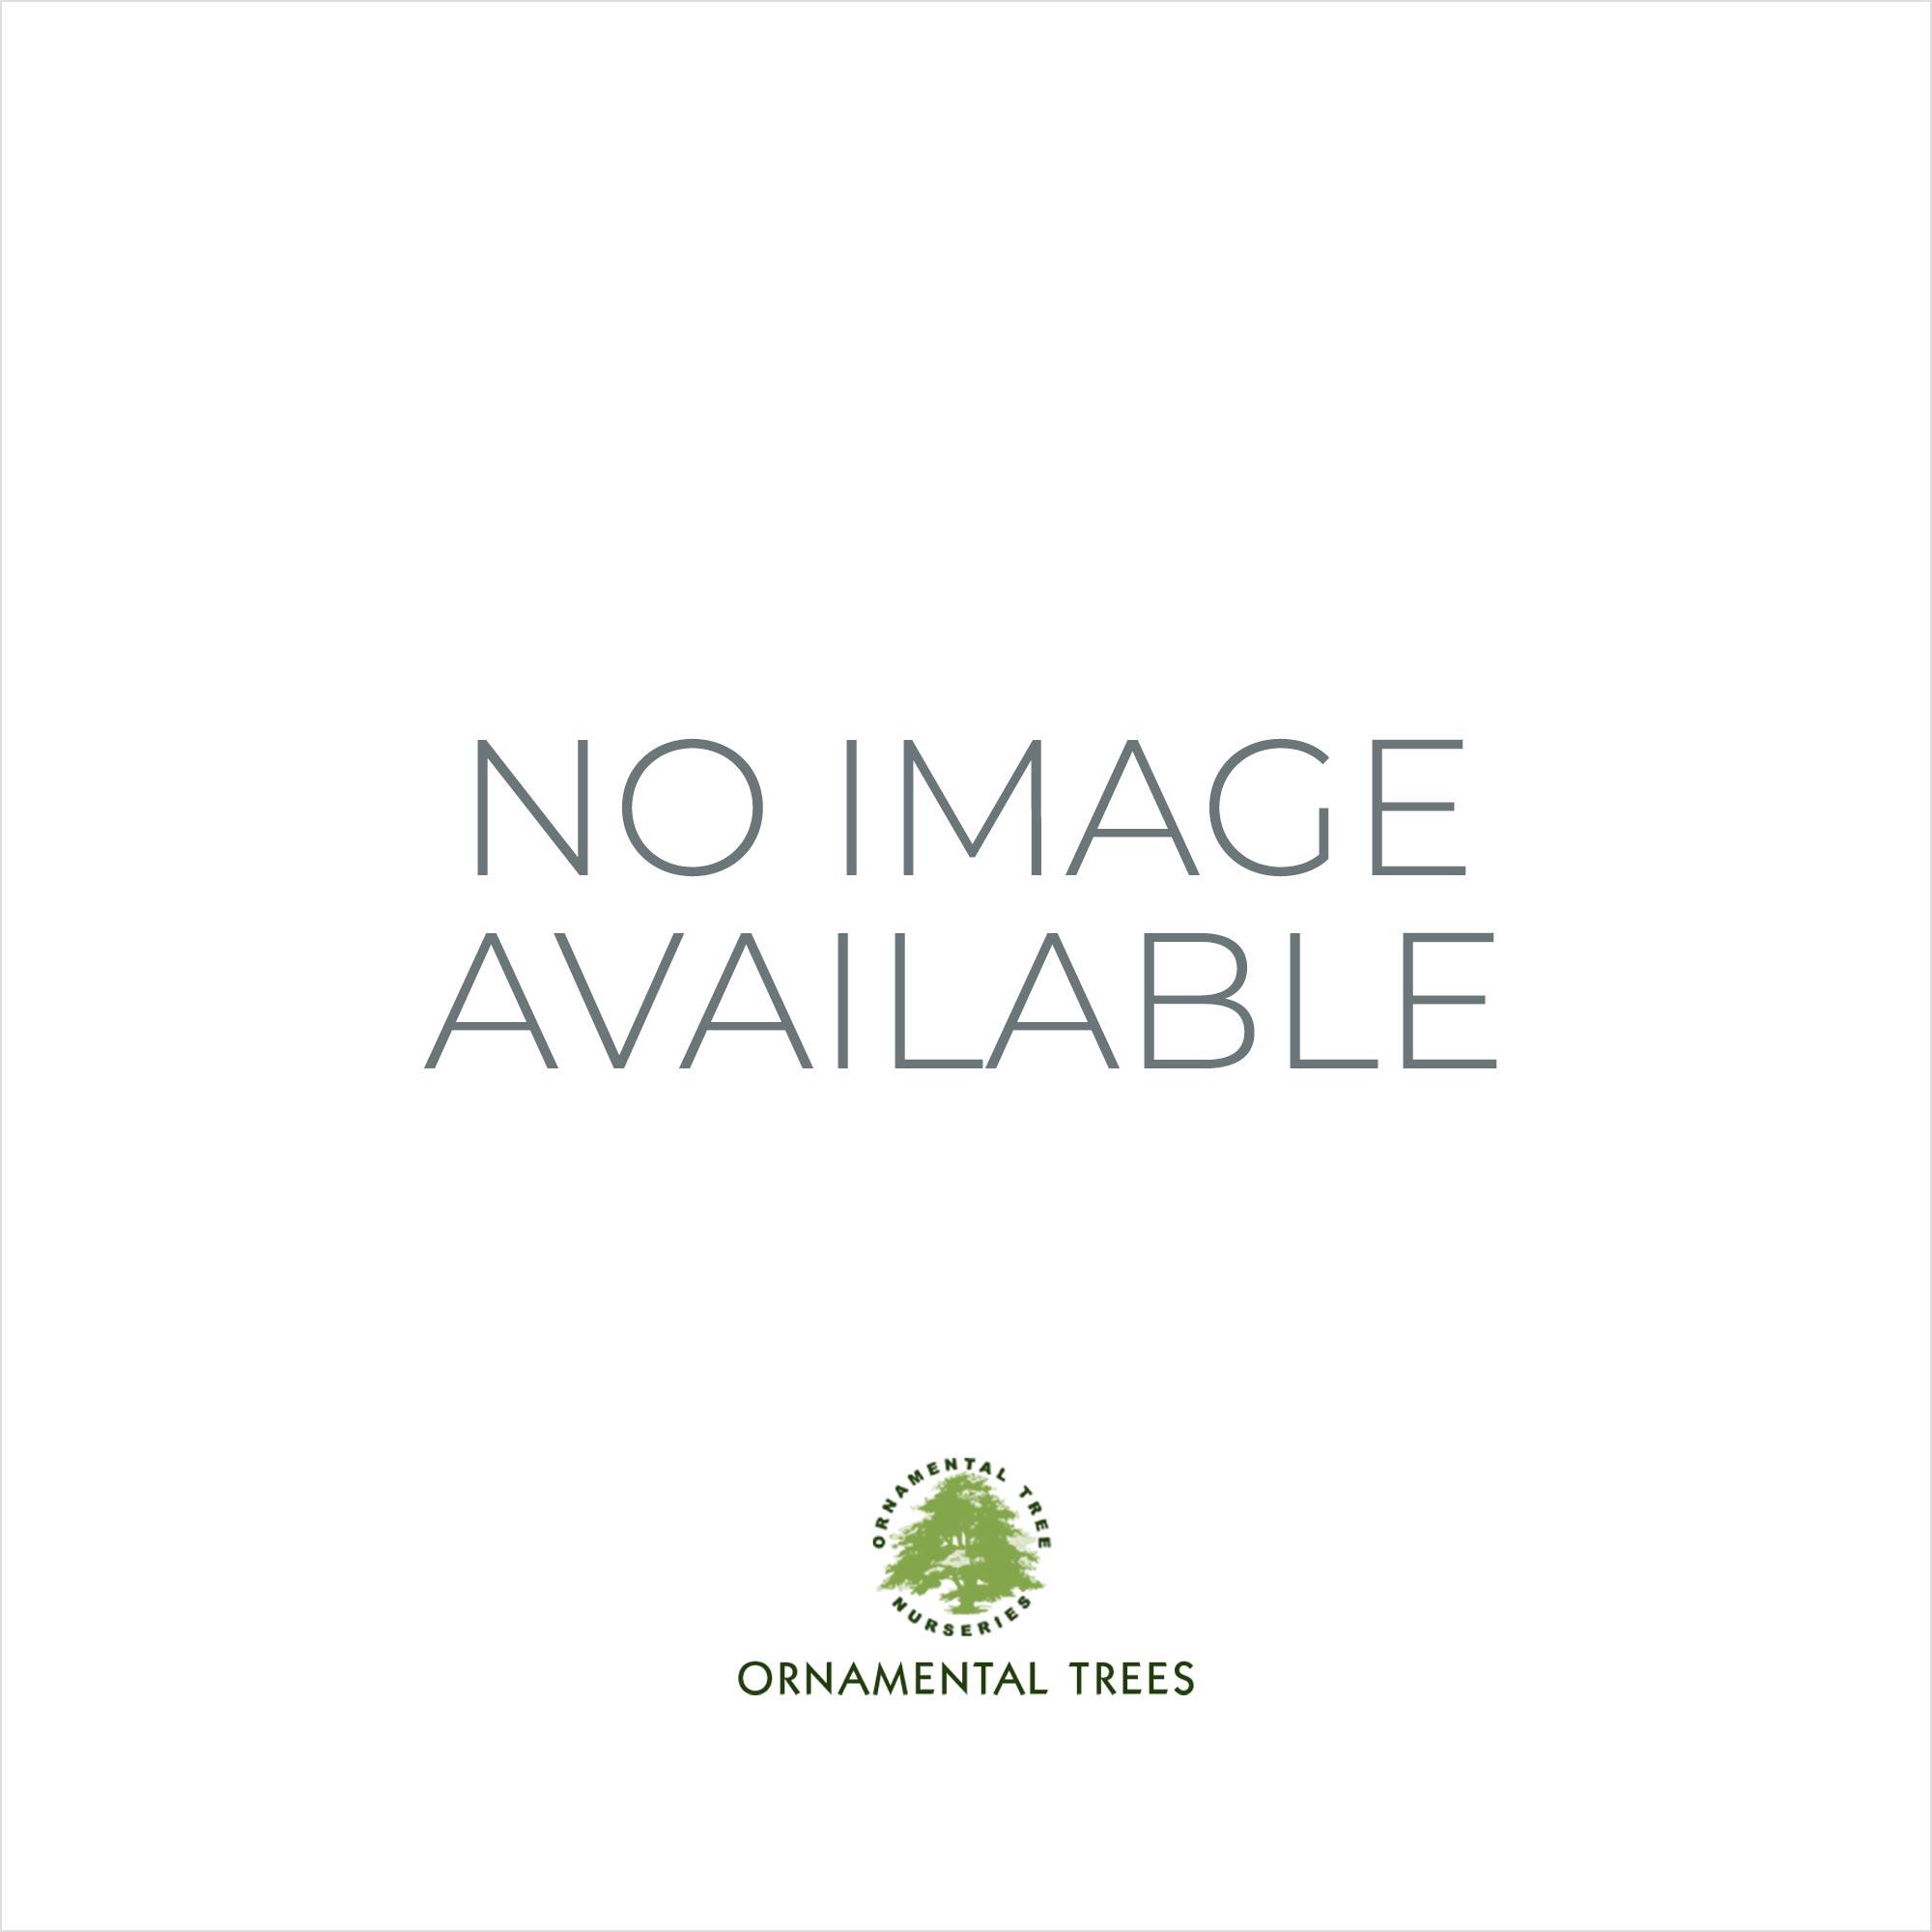 Ornamental evergreen trees -  Cedrus Atlantica Glauca Tree